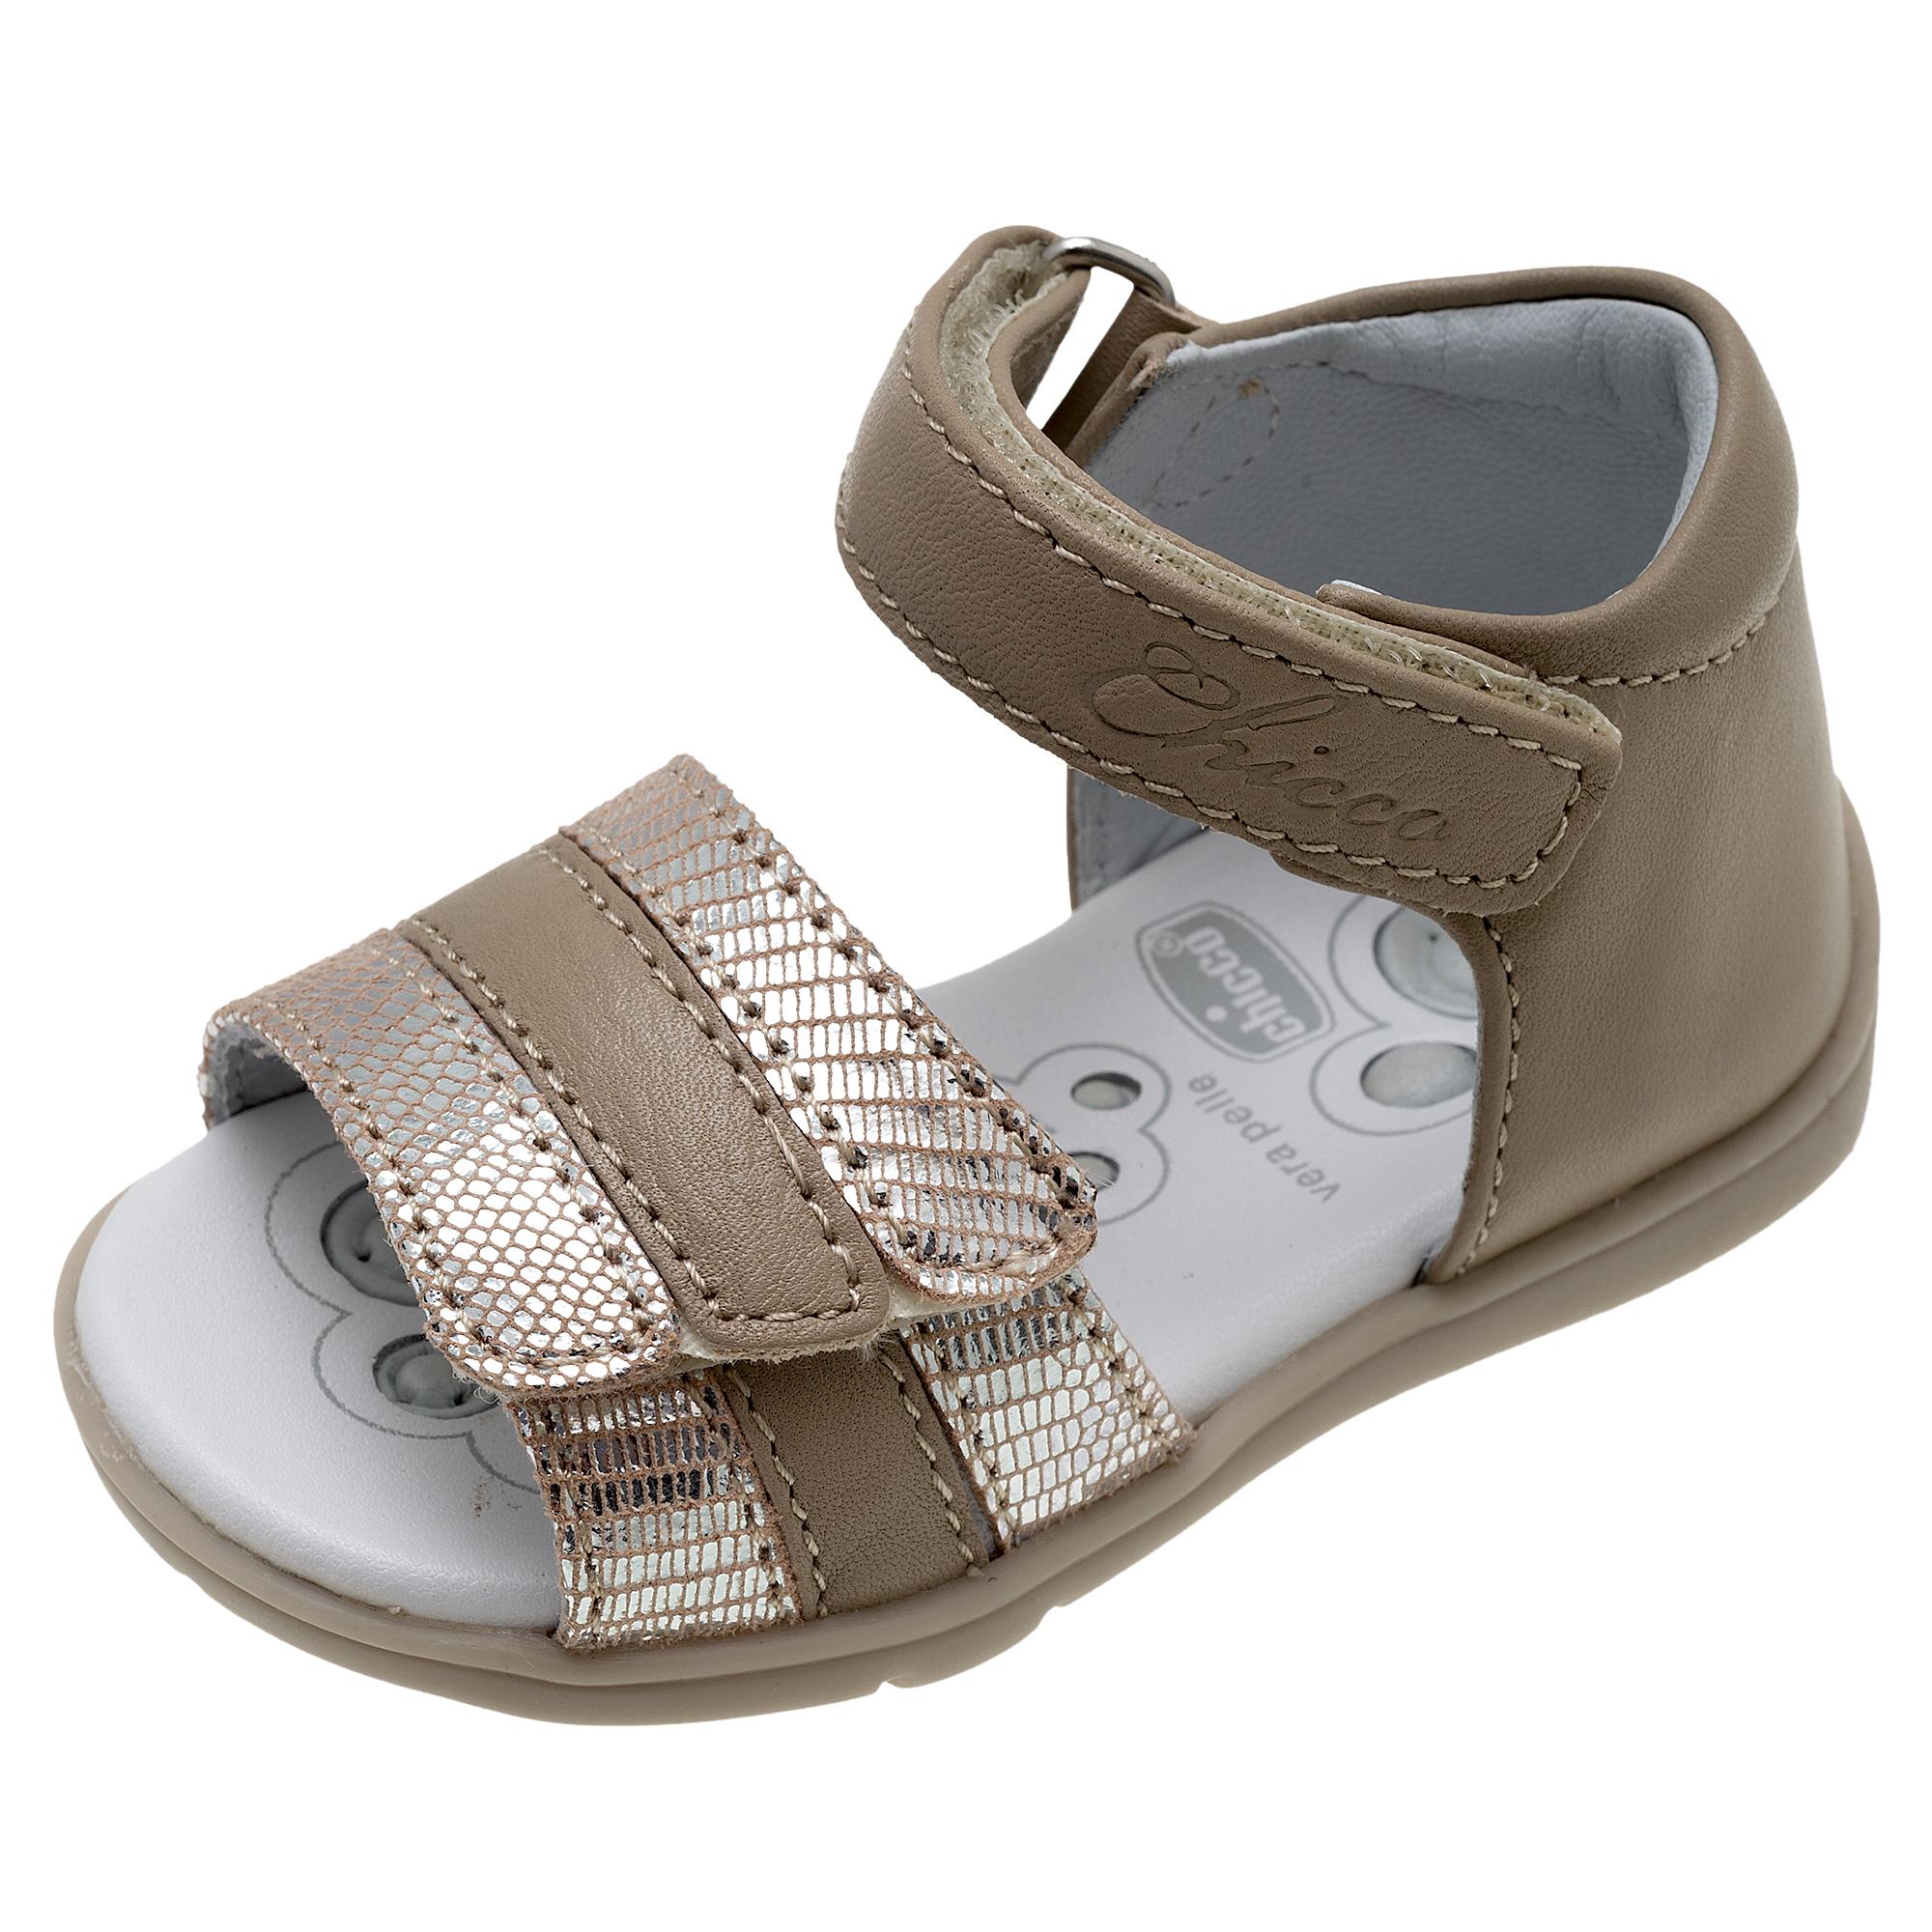 Sandale fetite Chicco Ginevras, piele bej, 61480 din categoria Sandale copii